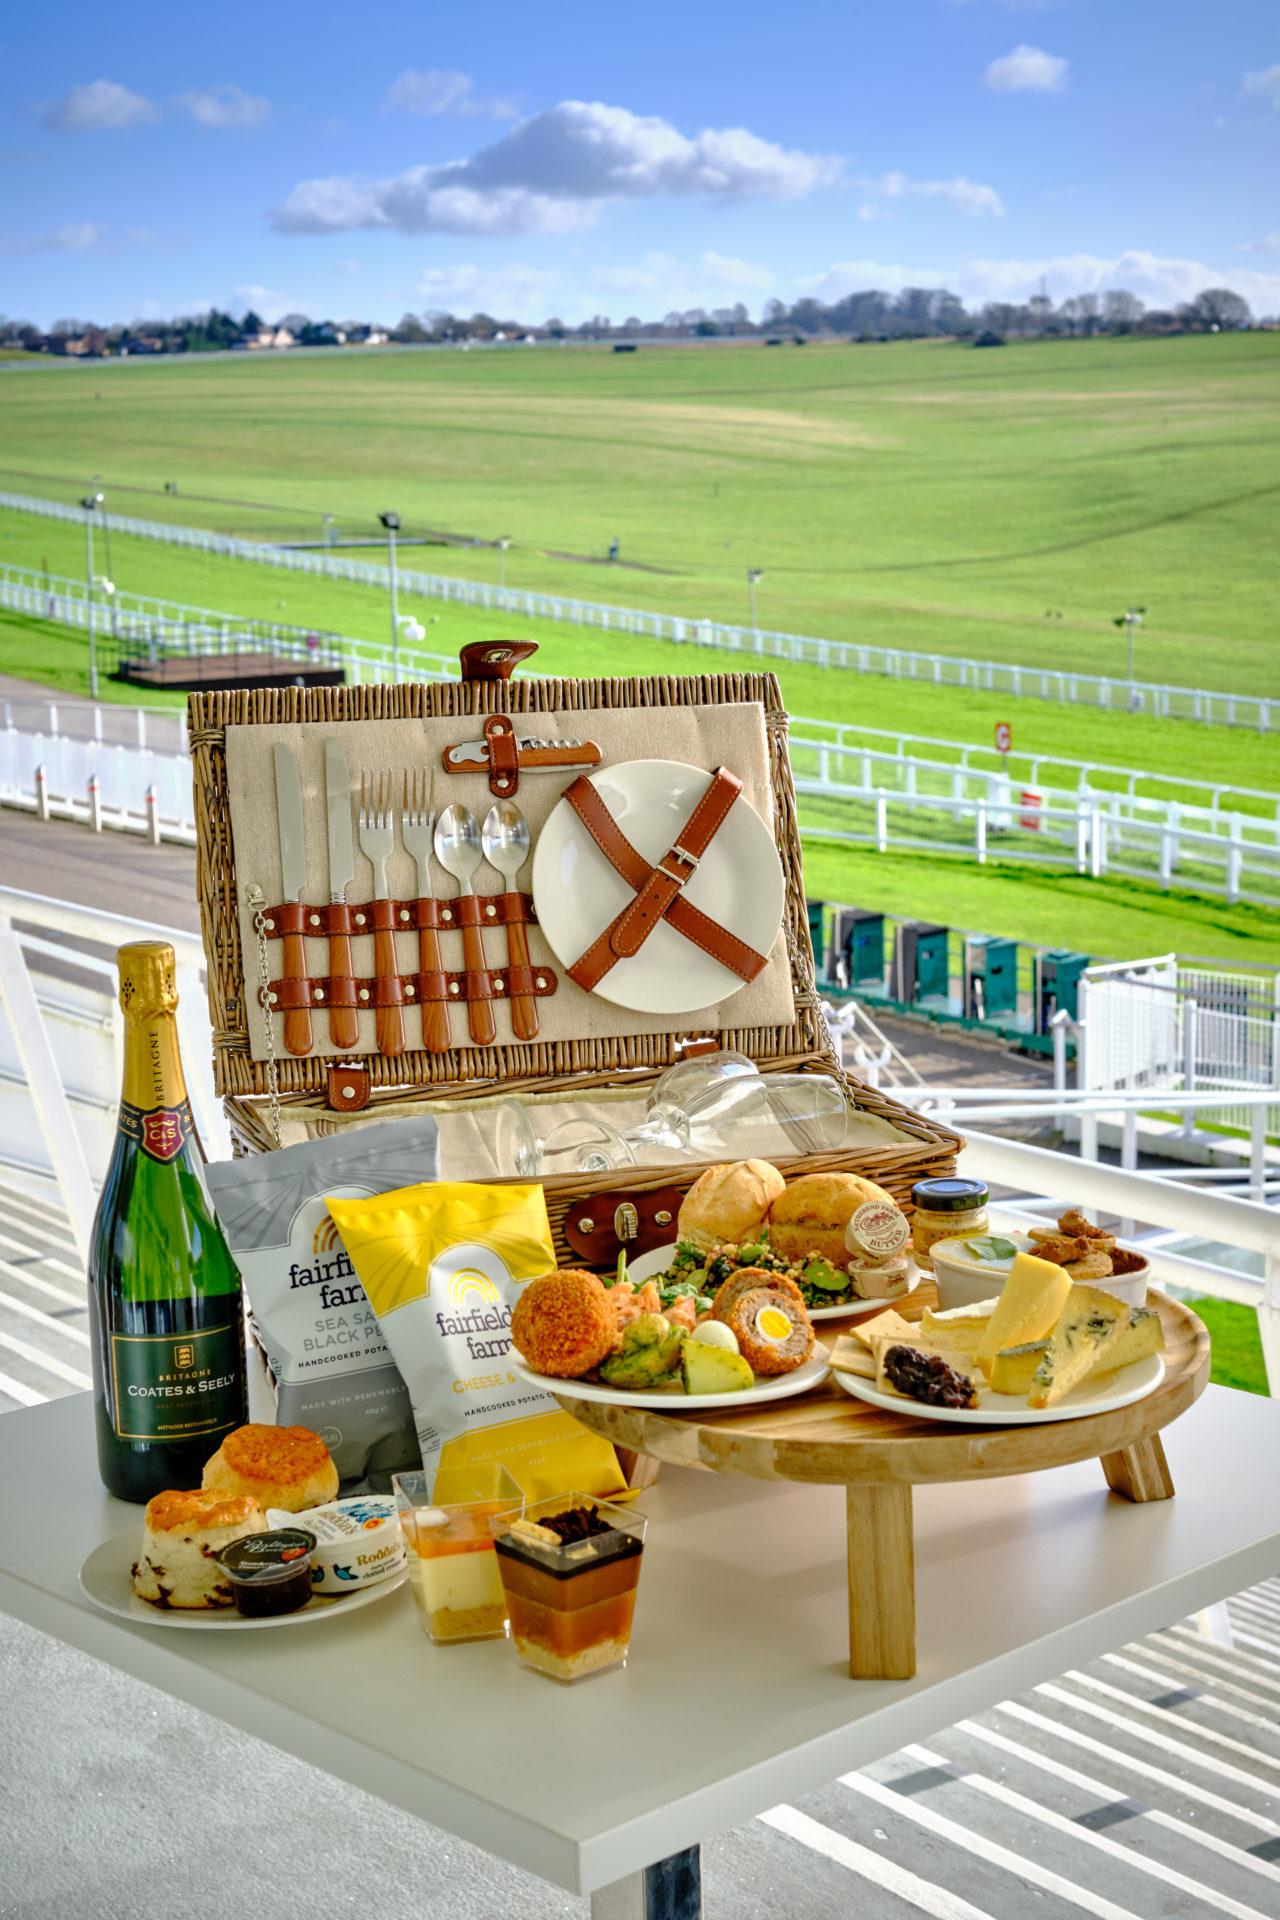 The perfect Great British picnic hamper